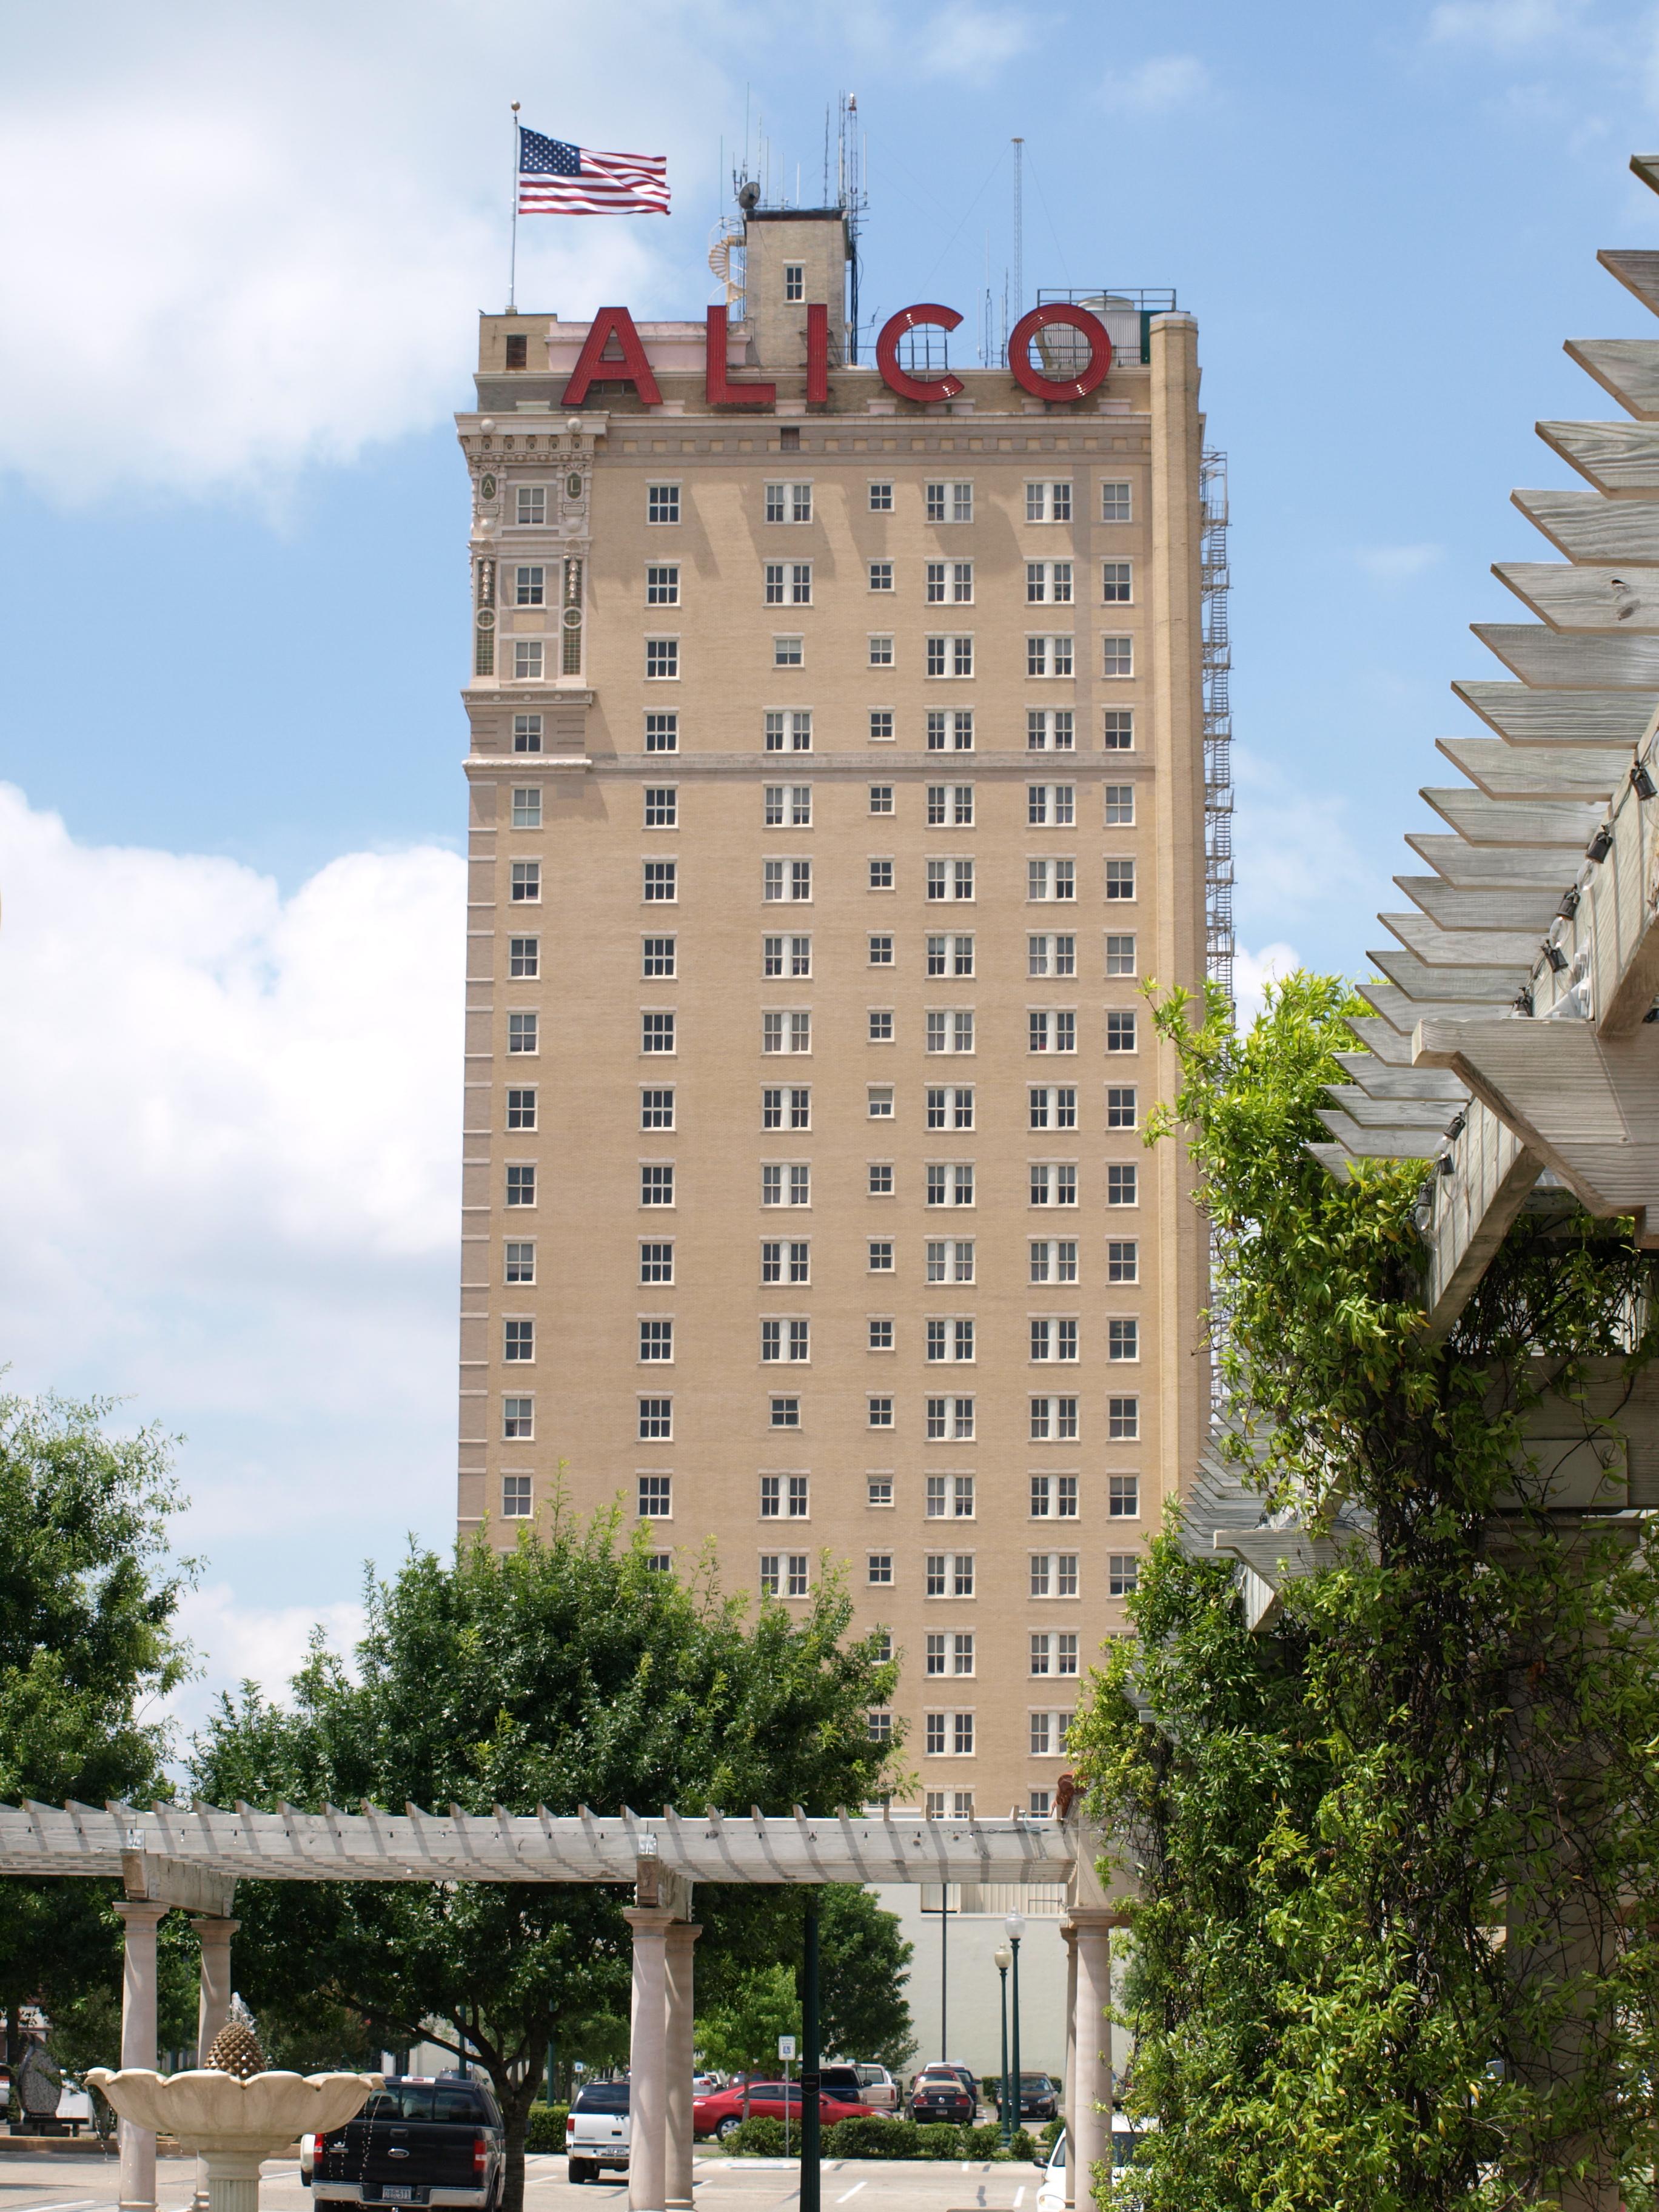 Waco texas familypedia for Waco builders